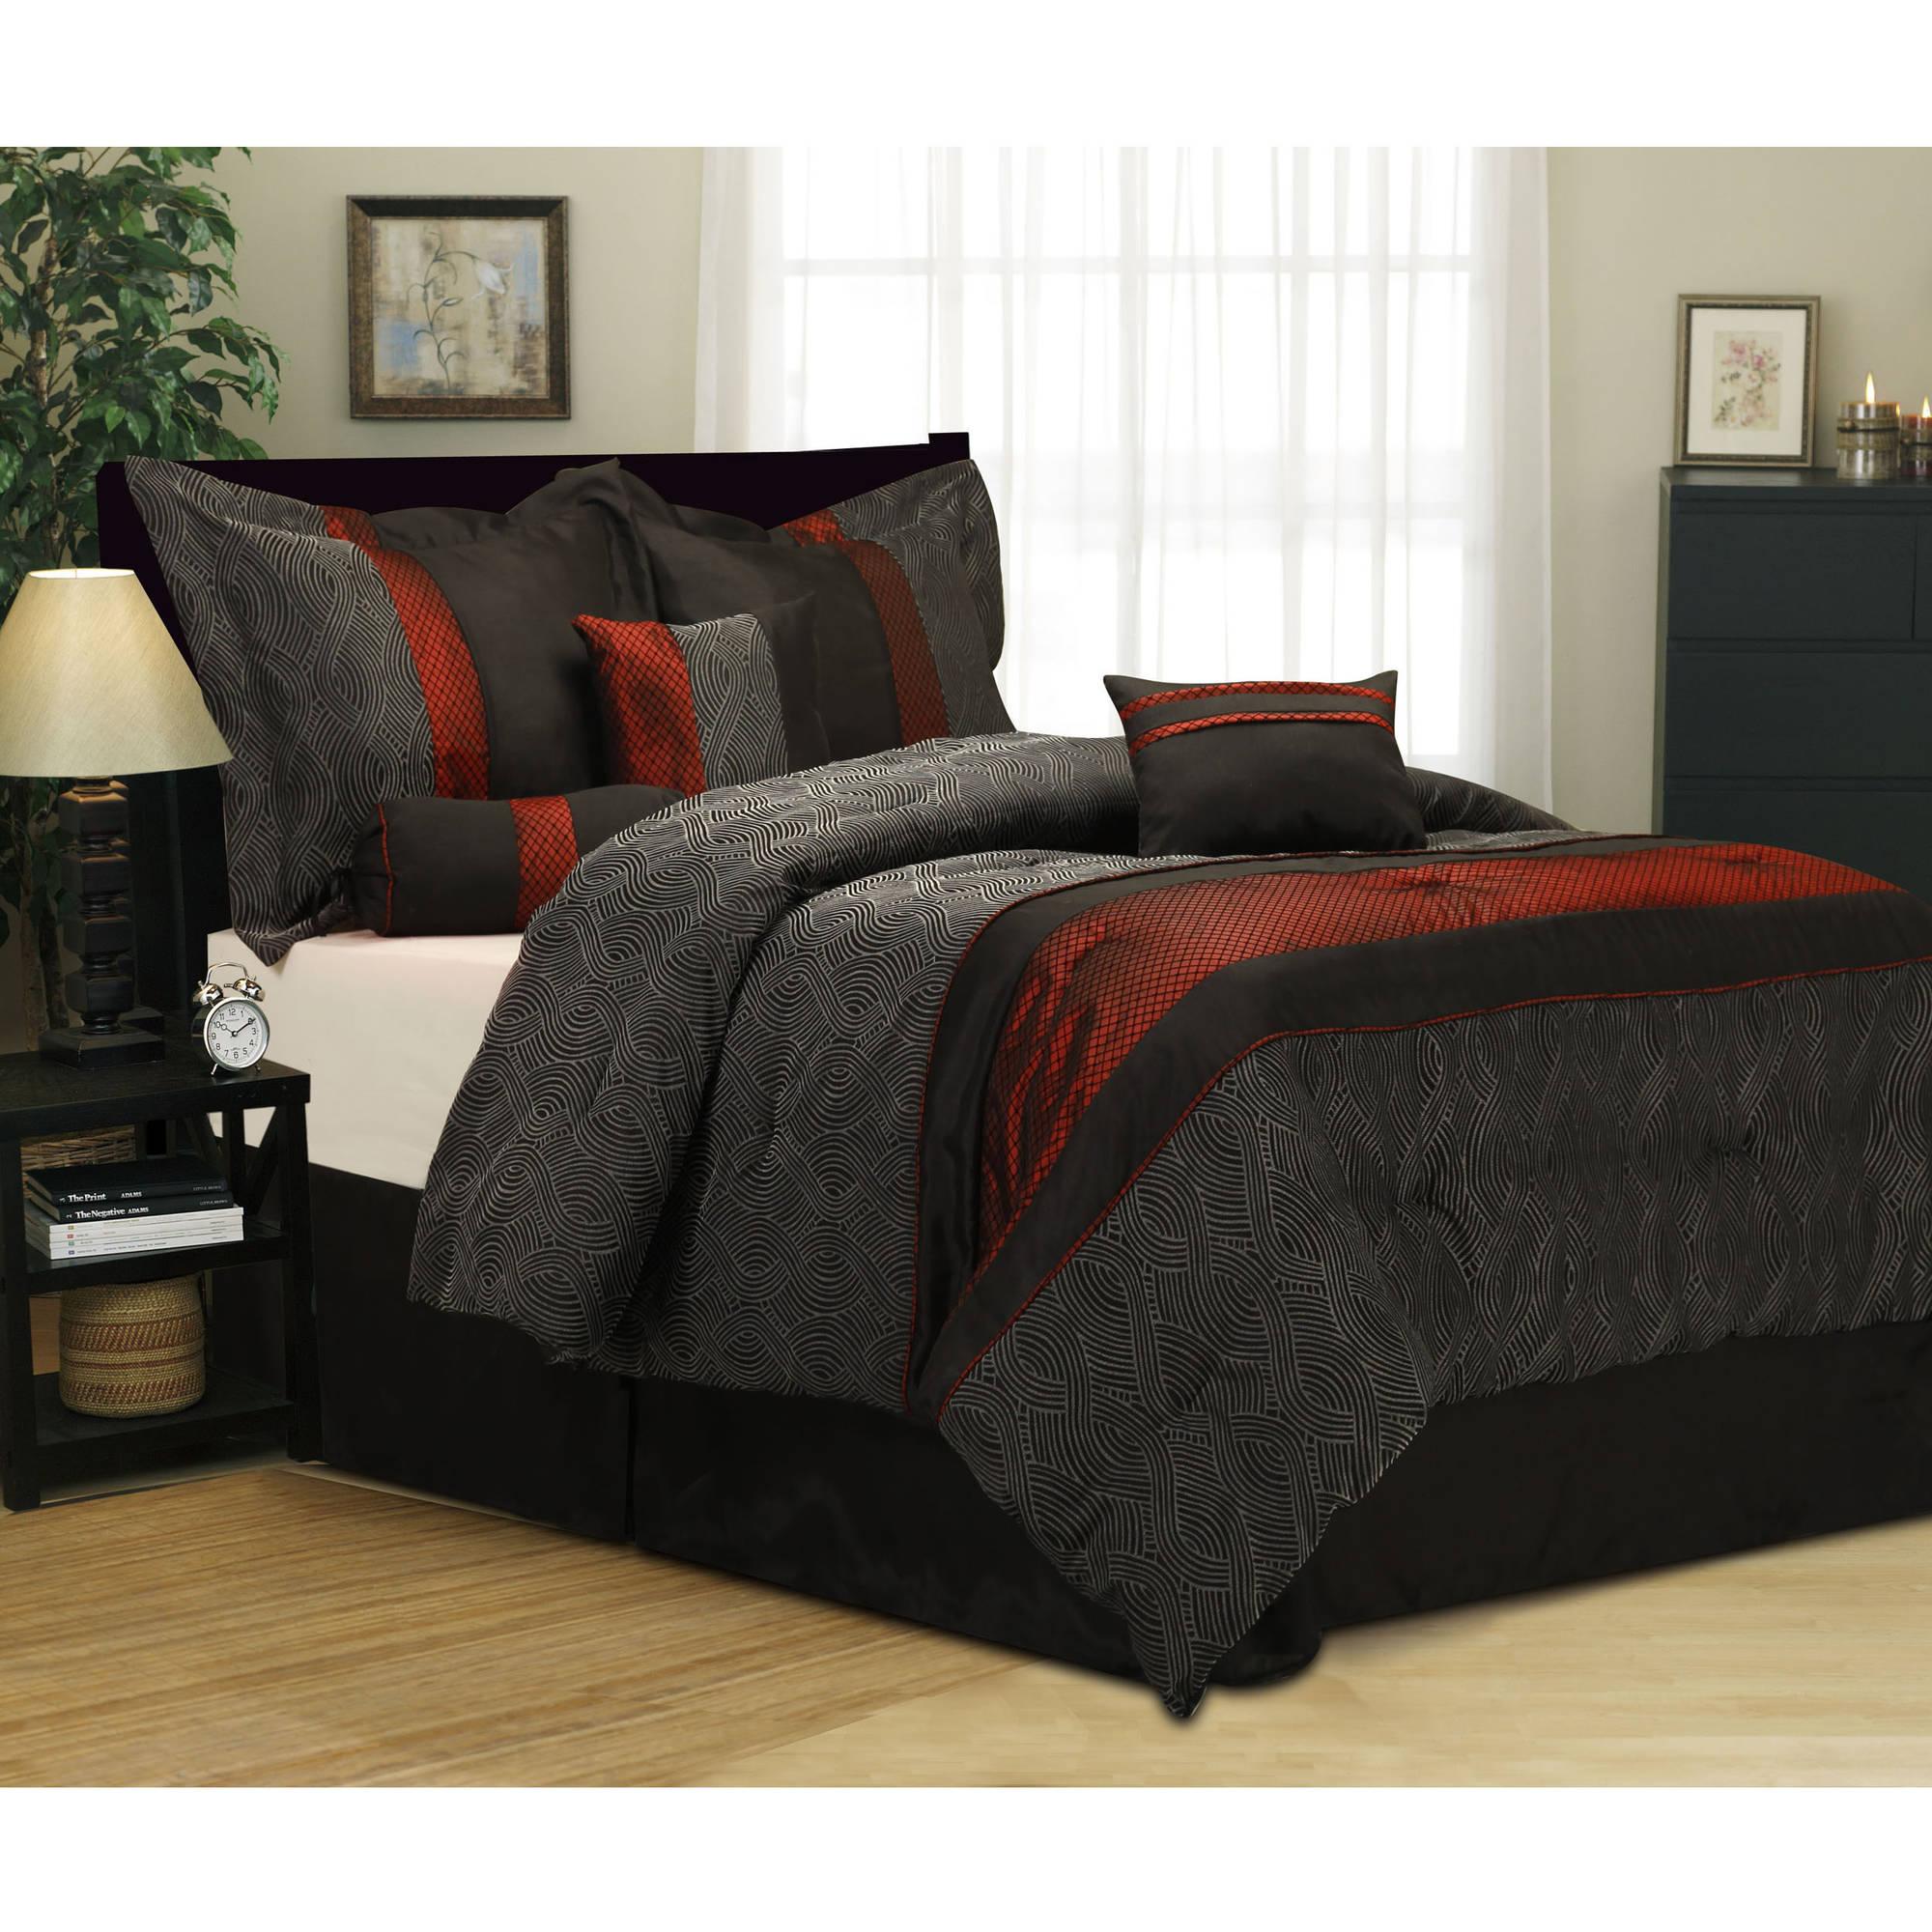 Corell 7 Piece Bedding Comforter Set Walmart Com